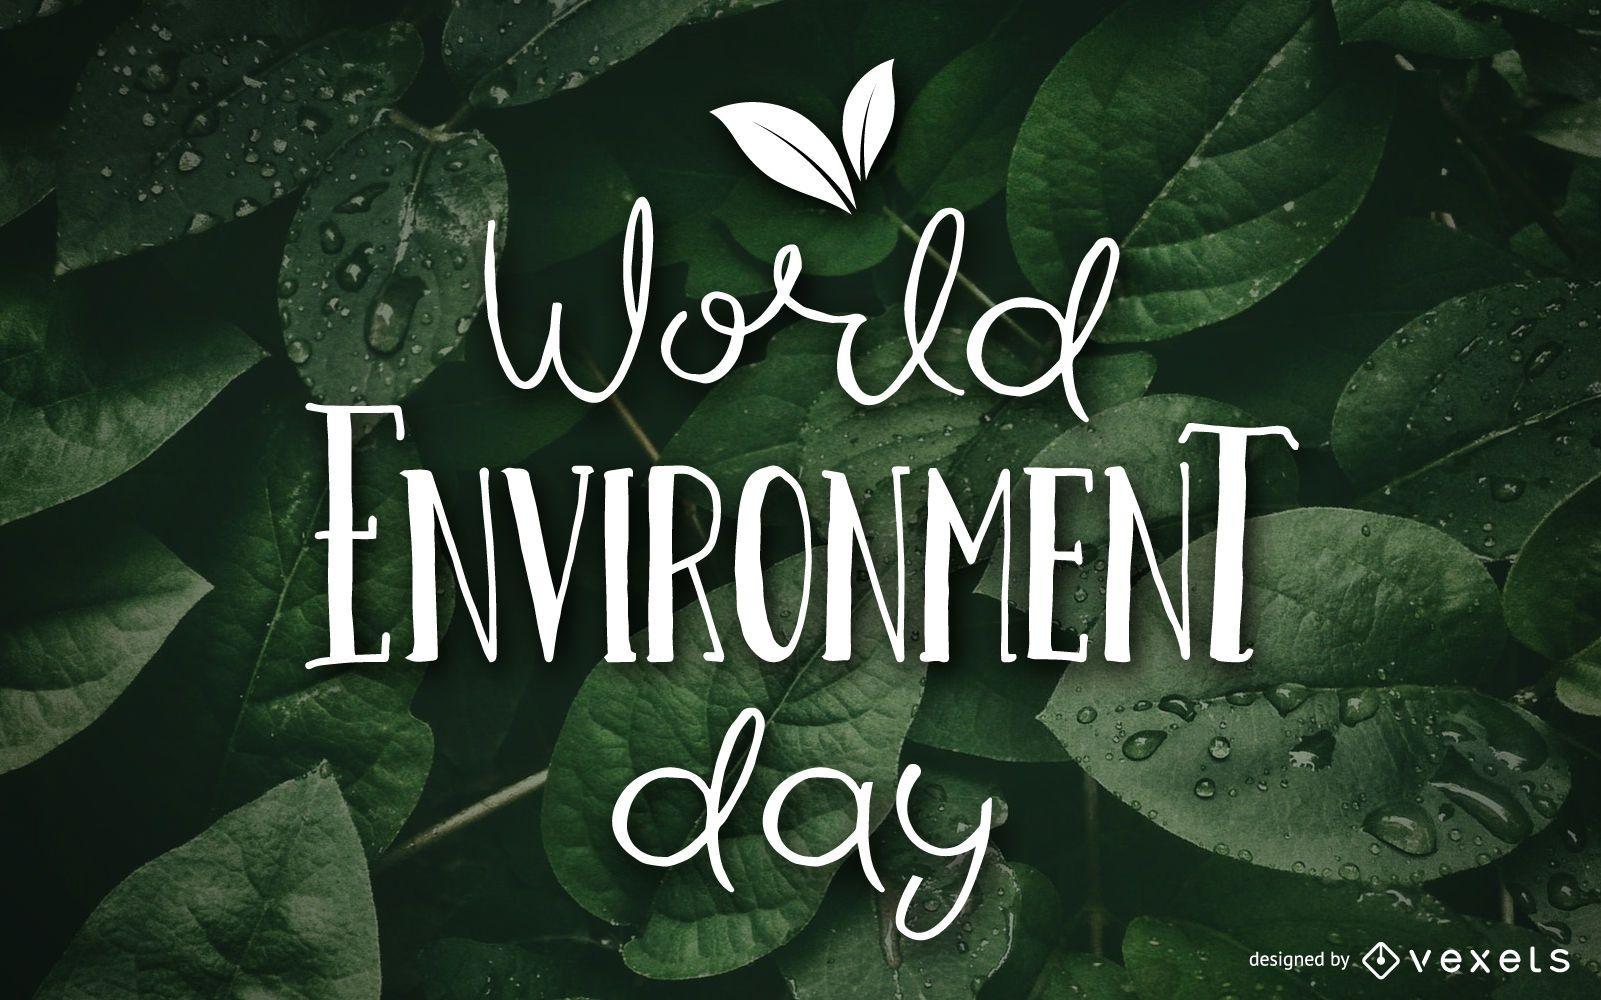 World environment day wallpaper design